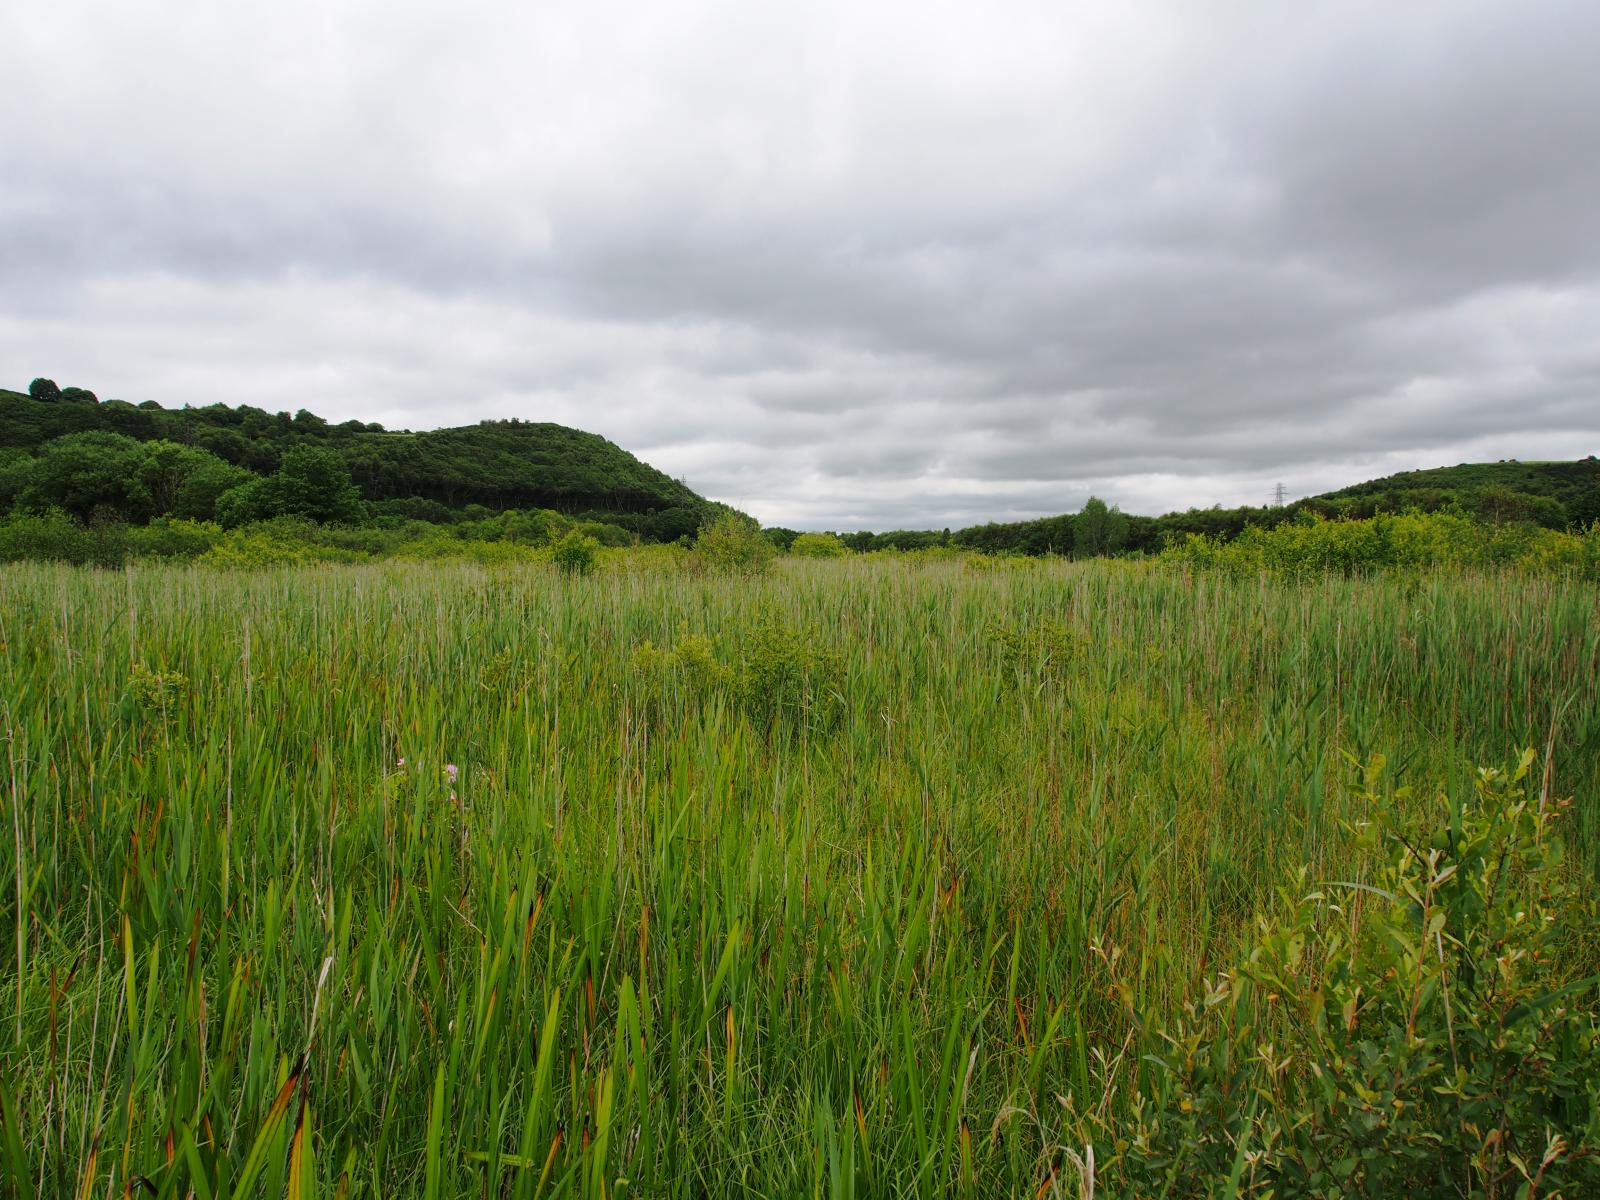 Marshland in New Jersey